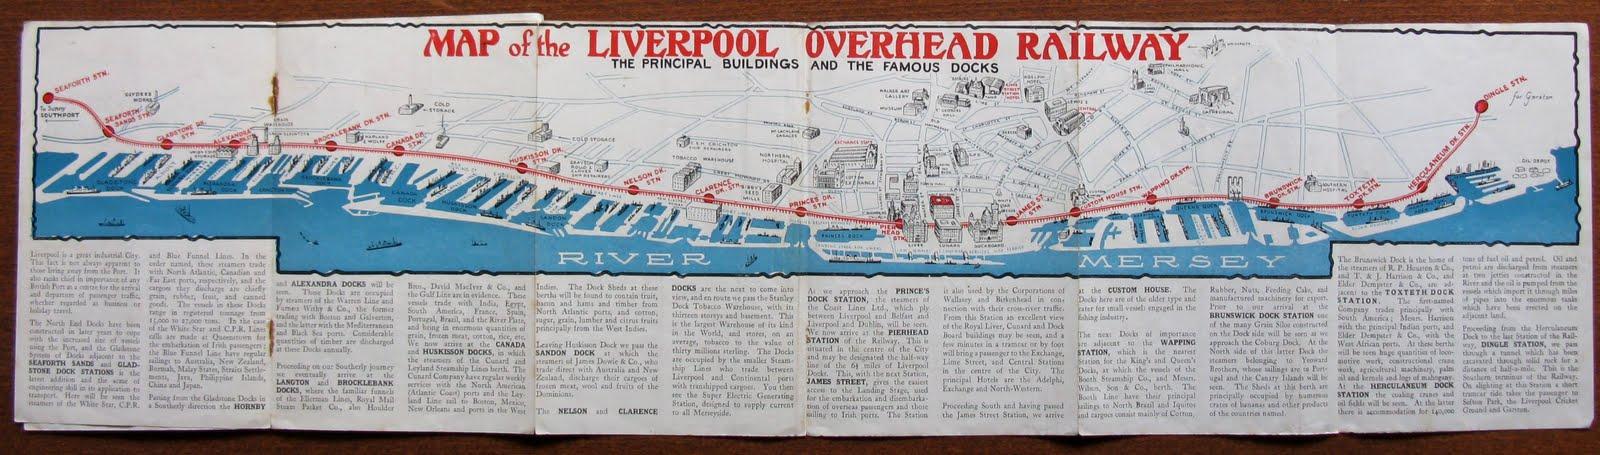 Liverpool%20Overhead%20Railway%201.jpg